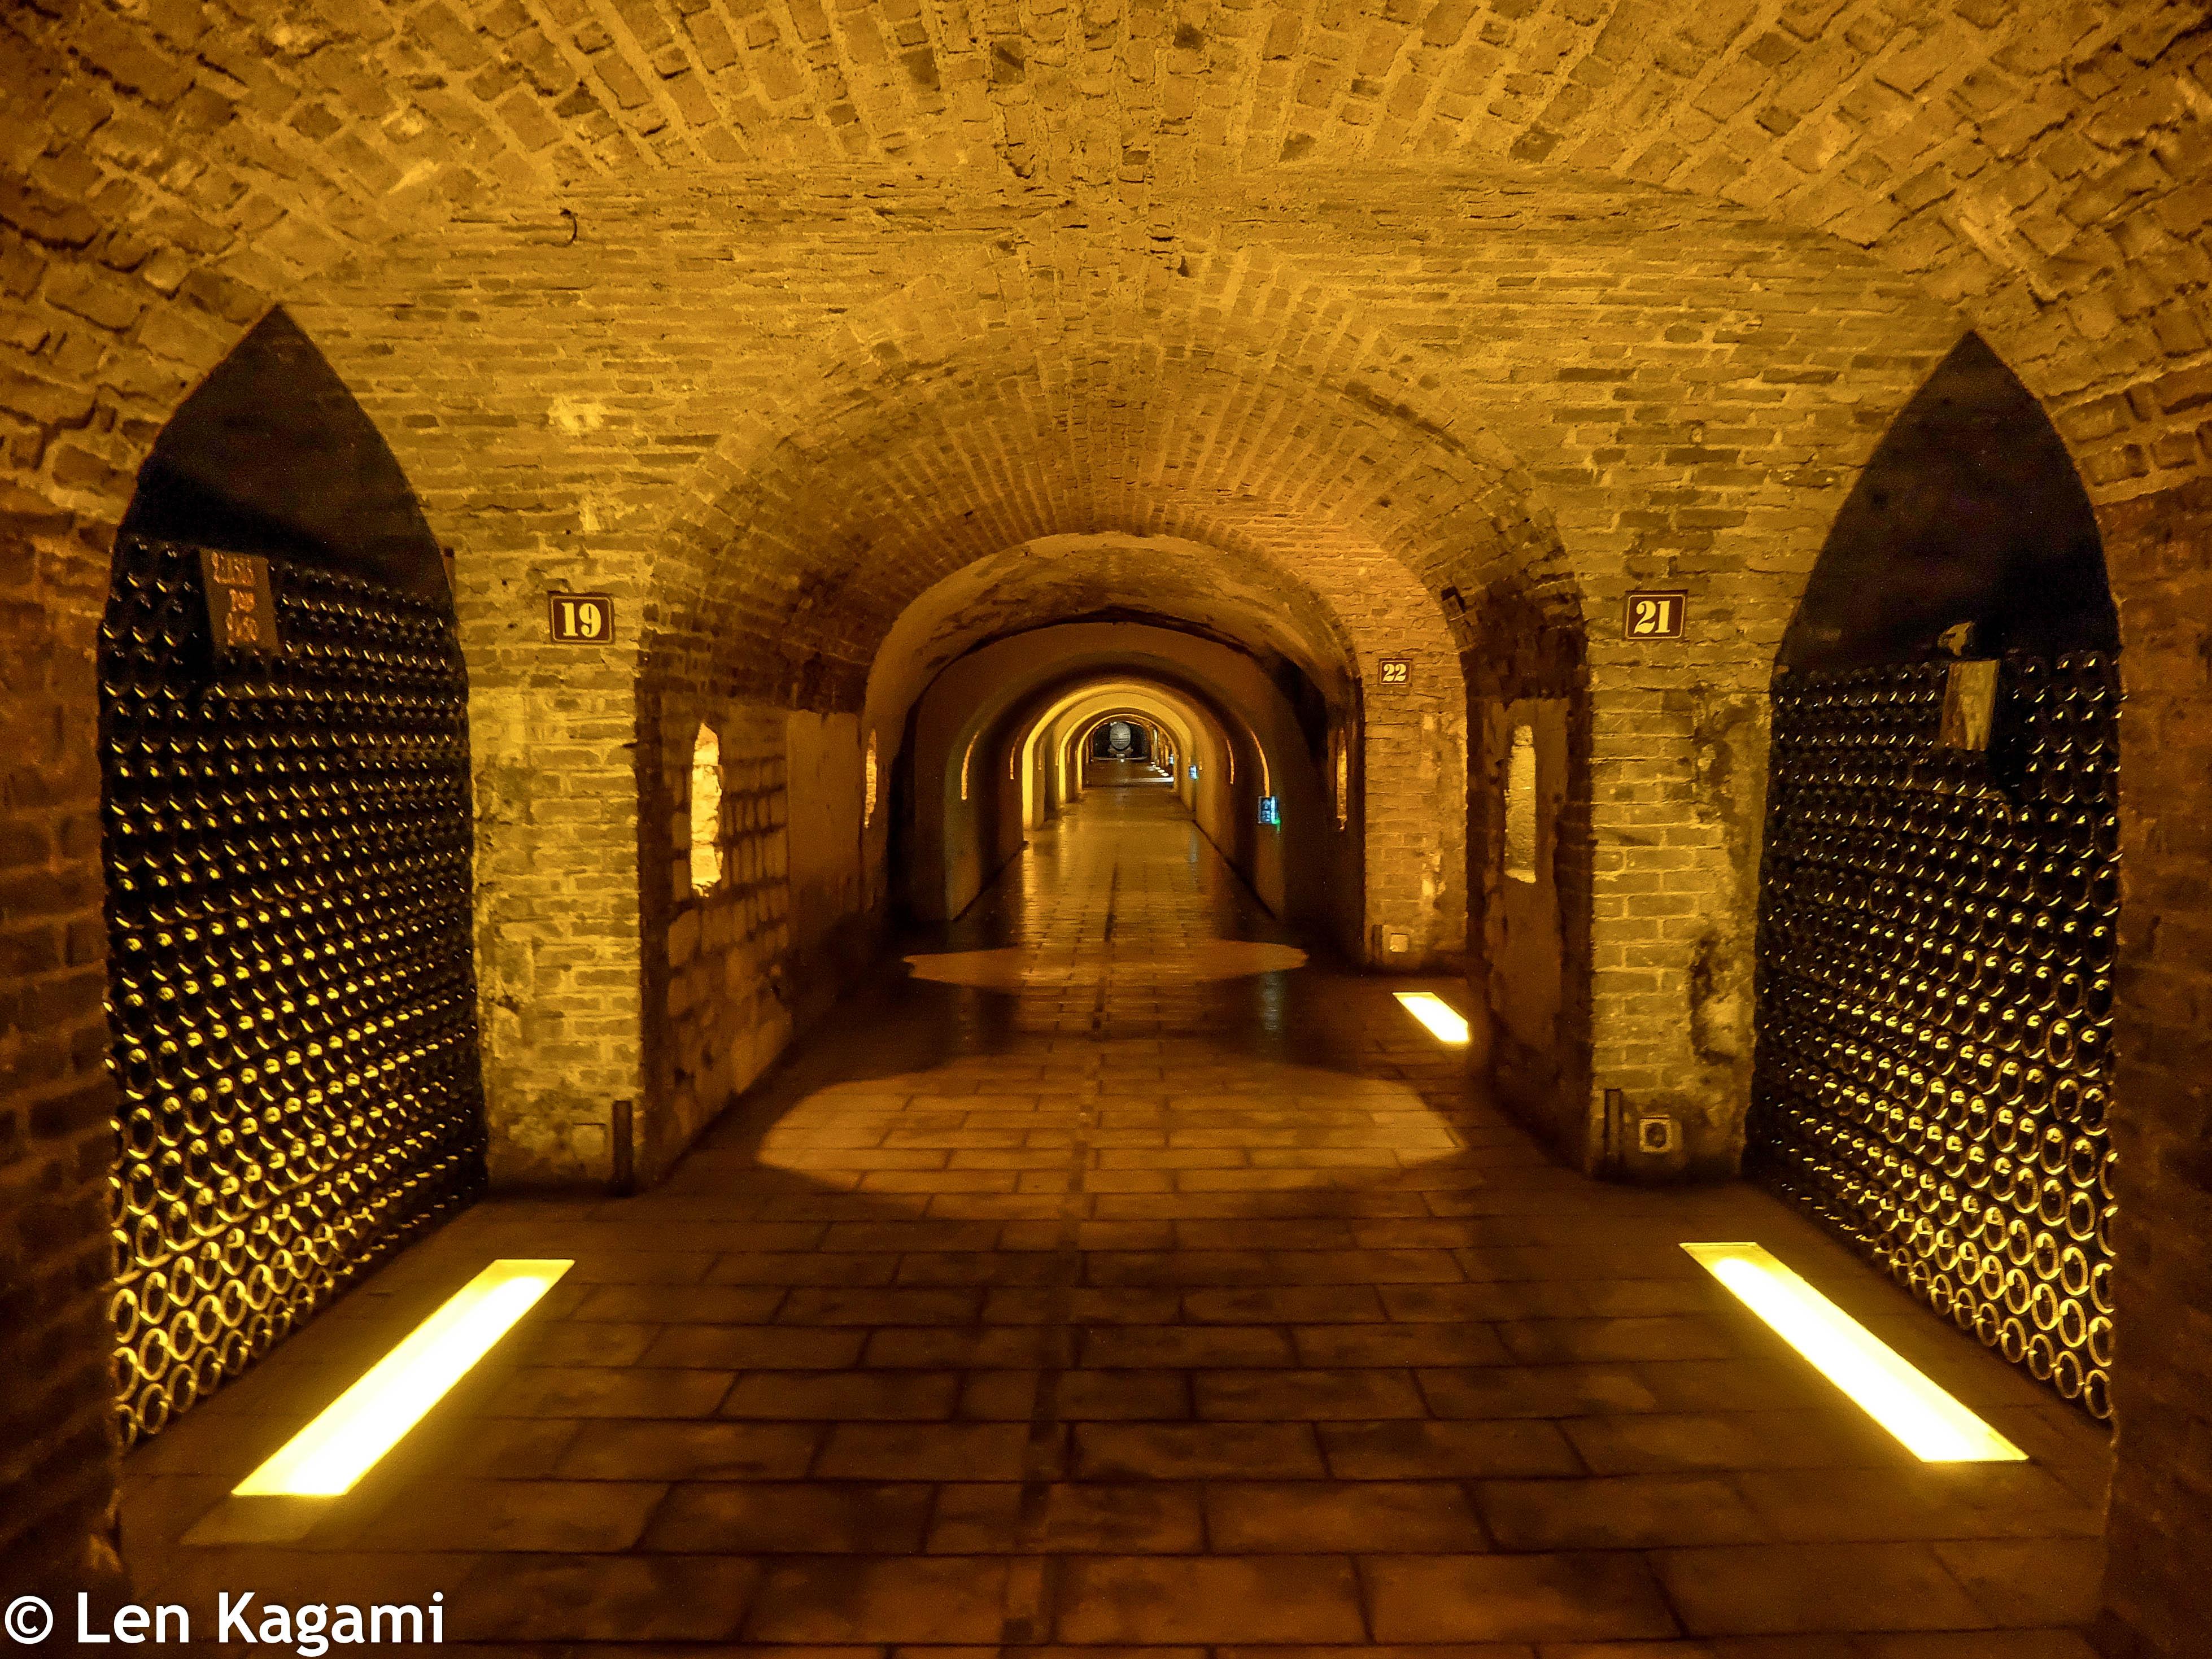 Moët & Chandon Wine Cellar